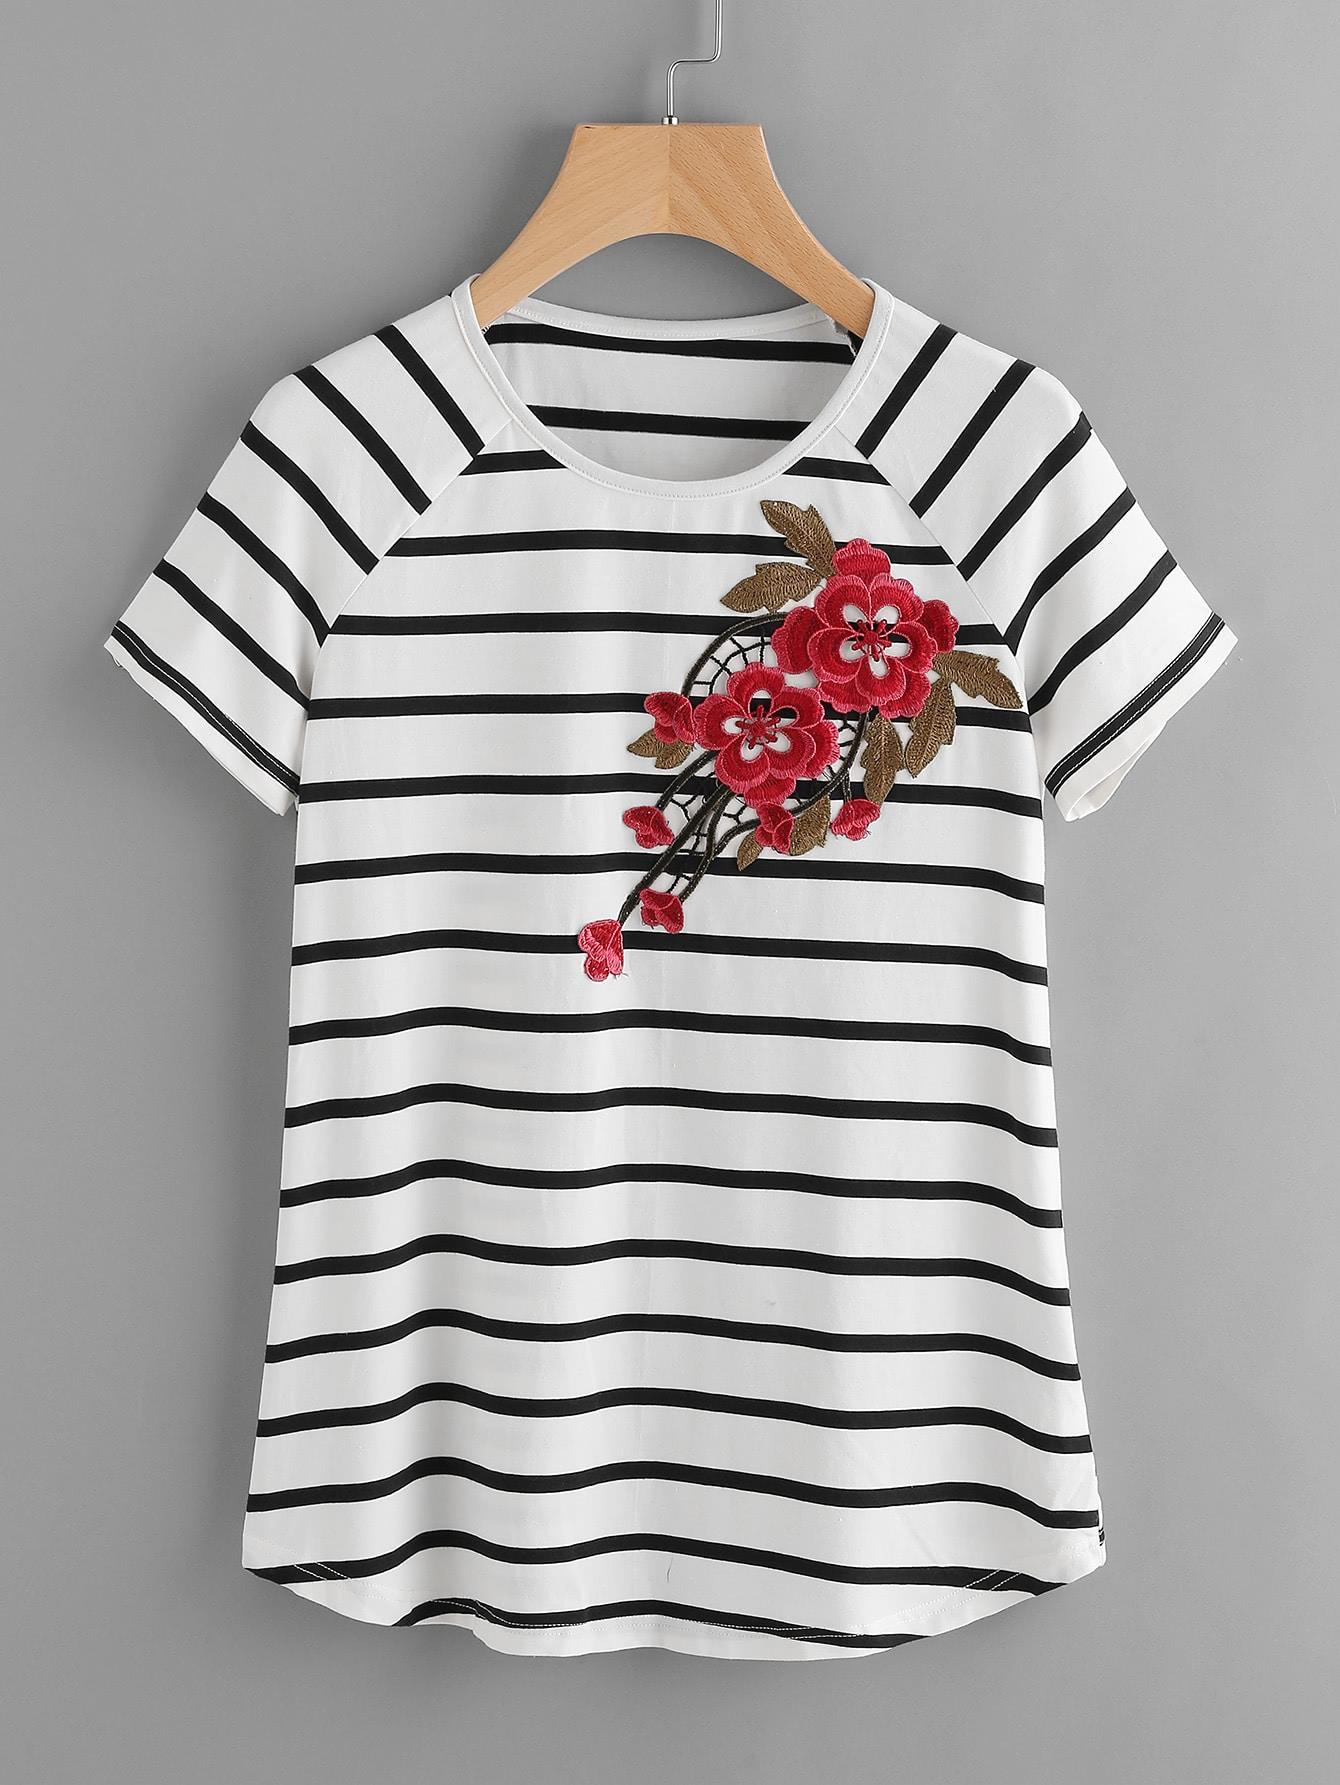 Фото Striped Raglan Sleeve Embroidered Flower Patch T-shirt. Купить с доставкой